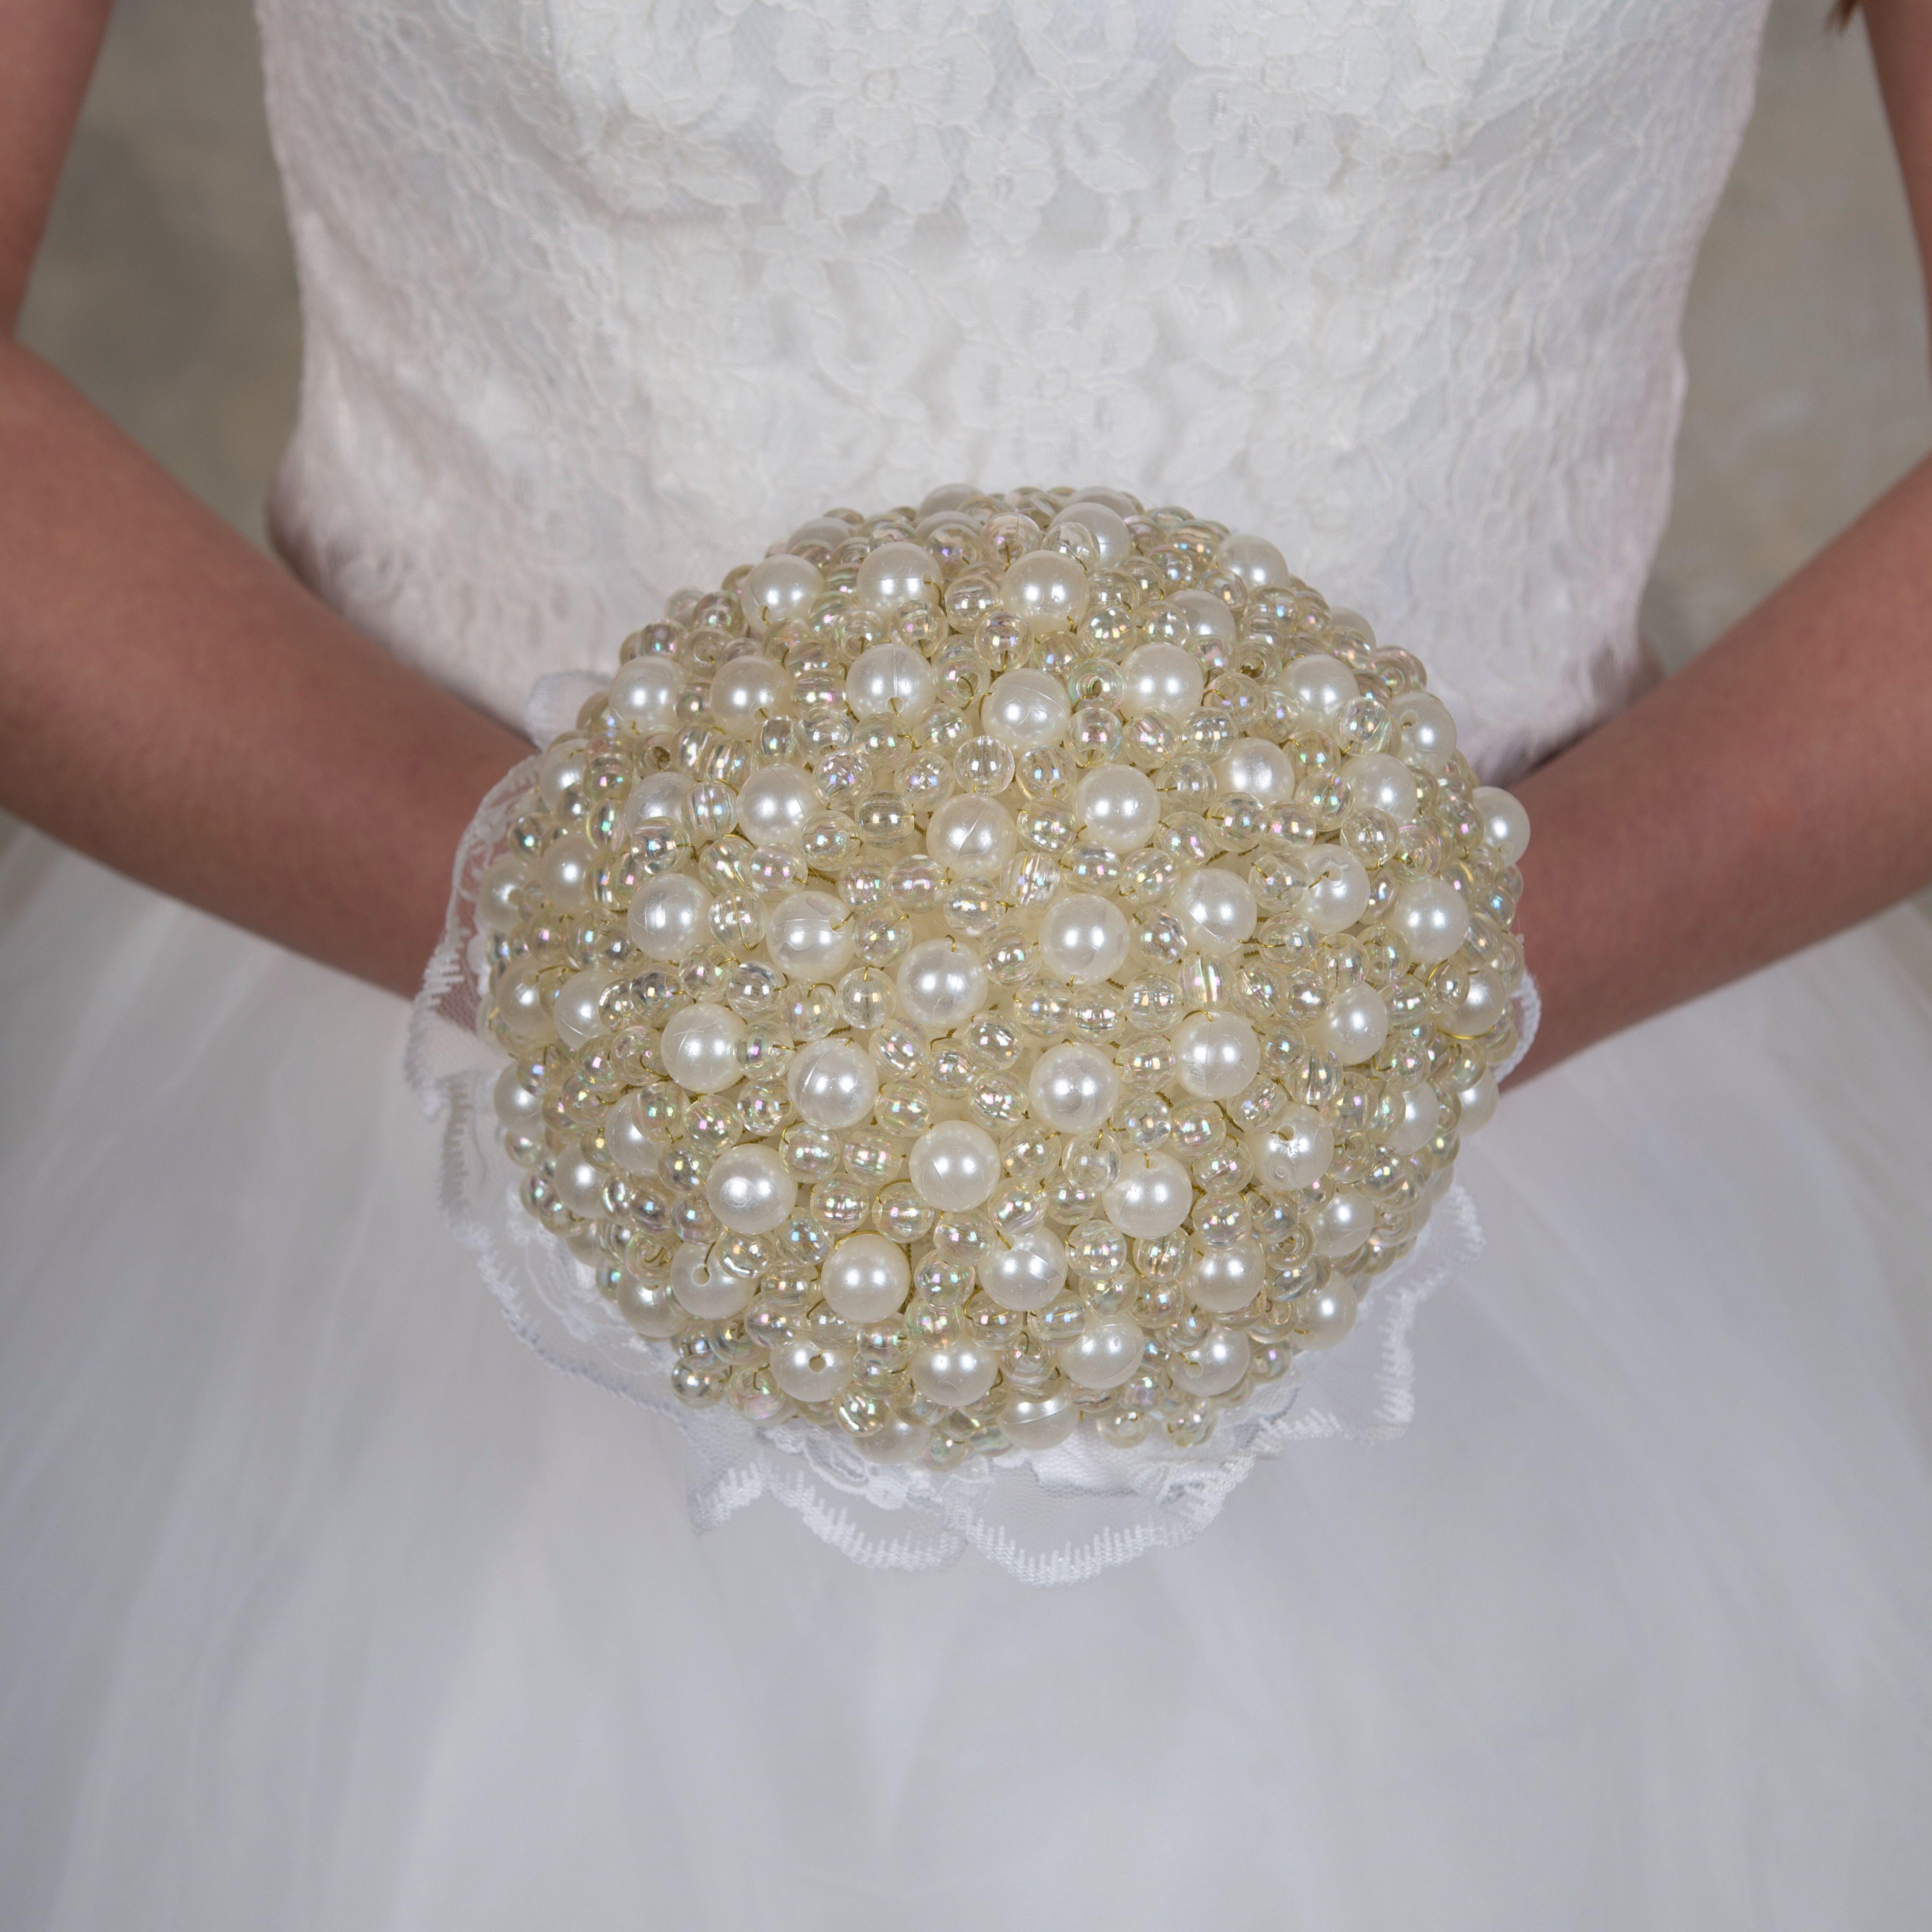 букетизбусин свадебныйаксессуар букетневесты букетдублер букетброшь свадьба